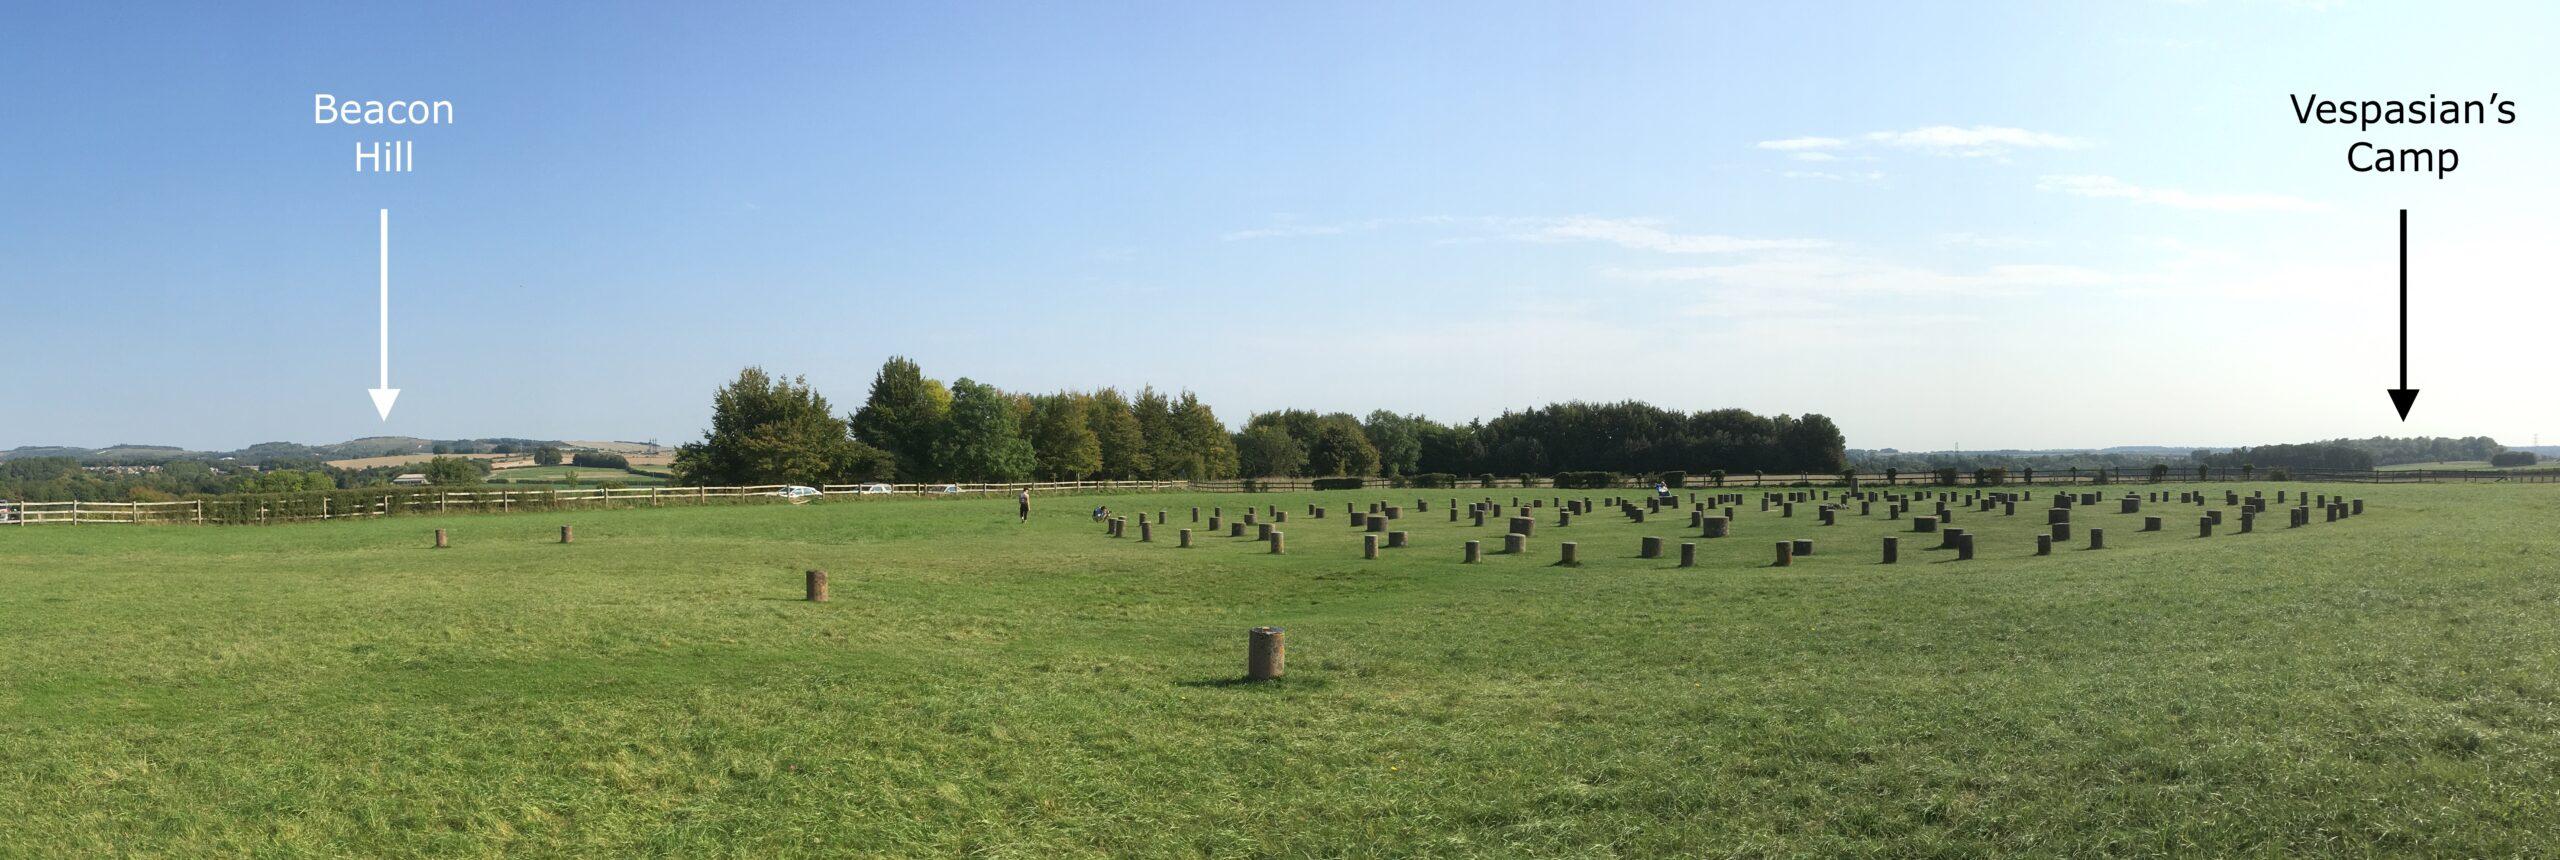 Woodhenge Eastern Horizon: Beacon Hill and Vespasian's Camp